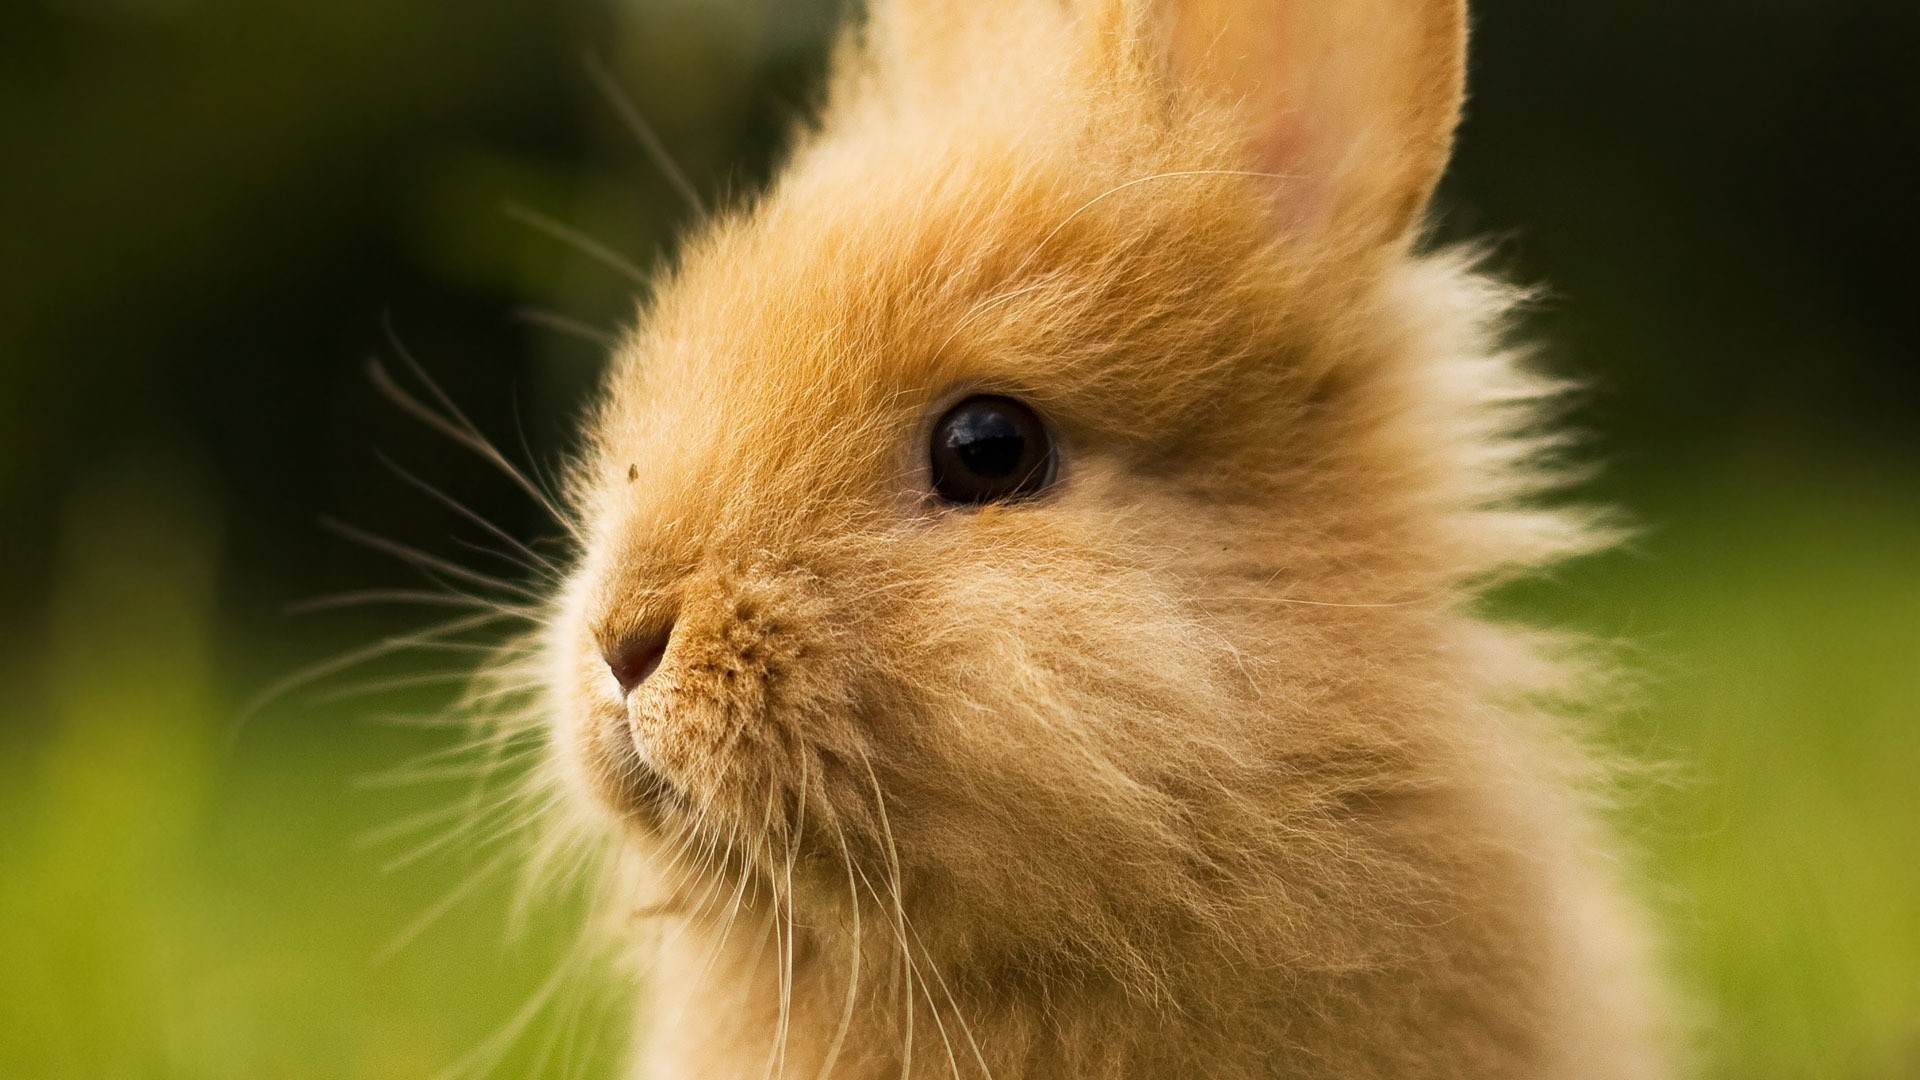 Bunny High Quality